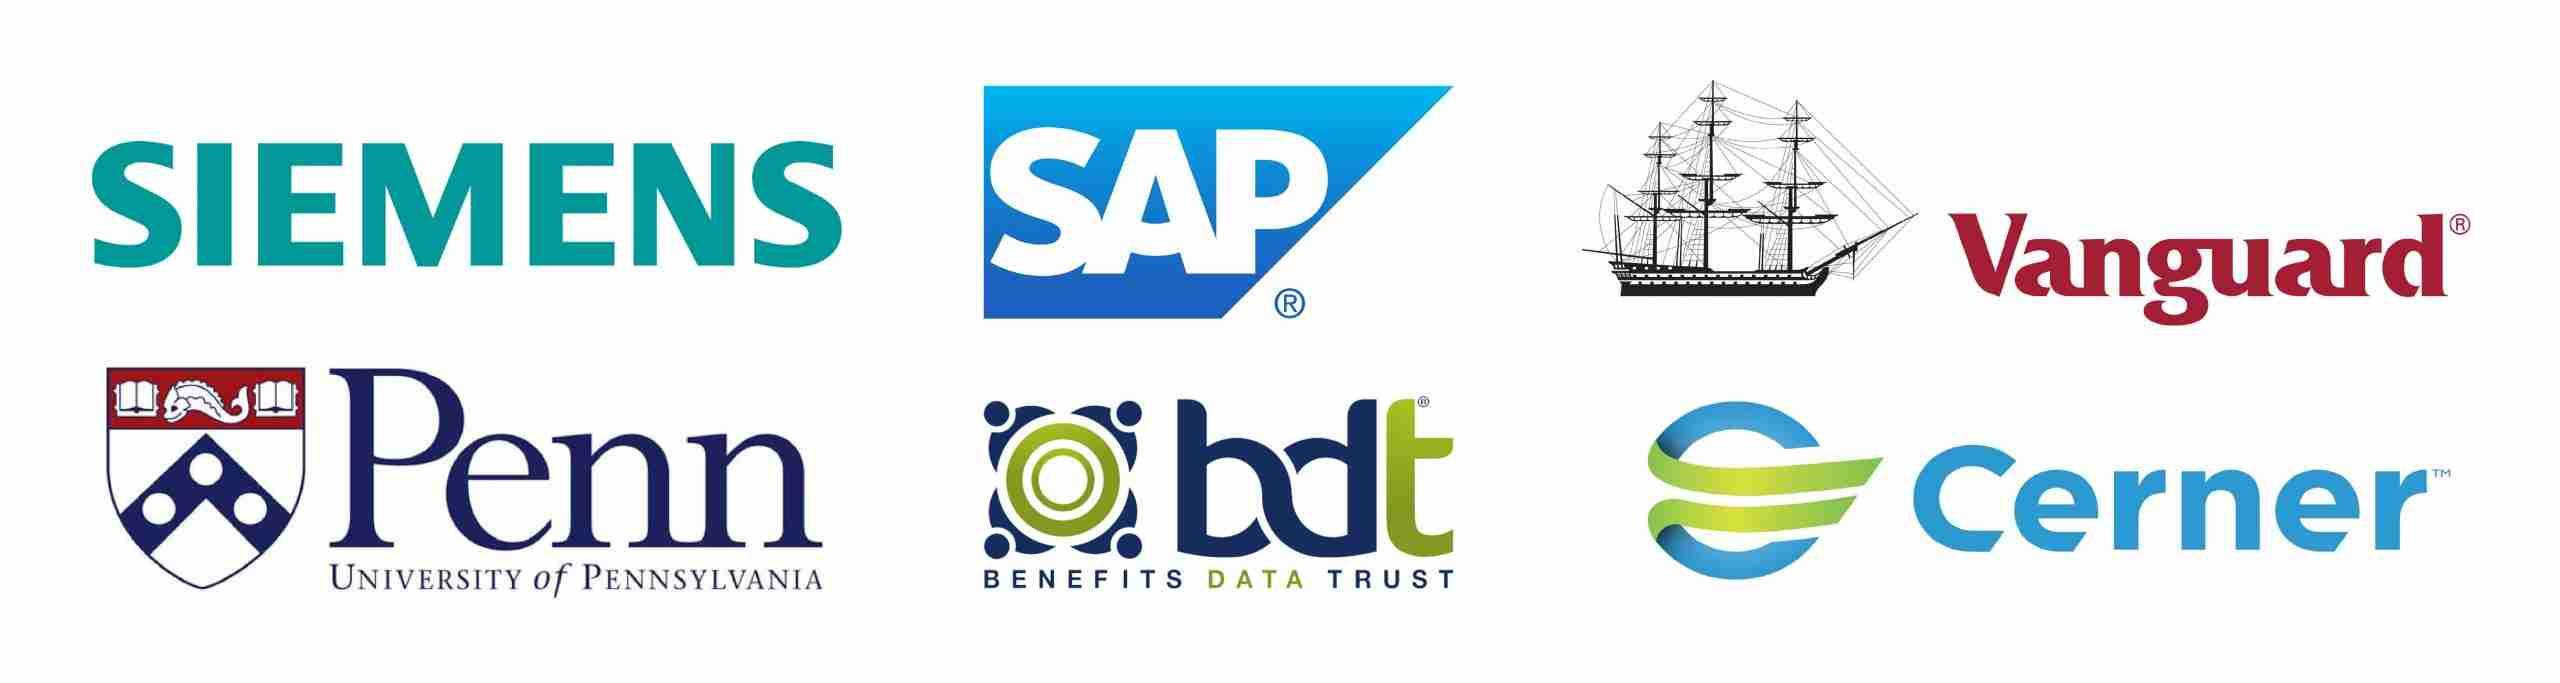 Logos Of Siemens, SAP, Vanguard, University Of Penn, Benefits Data Trust, Cerner